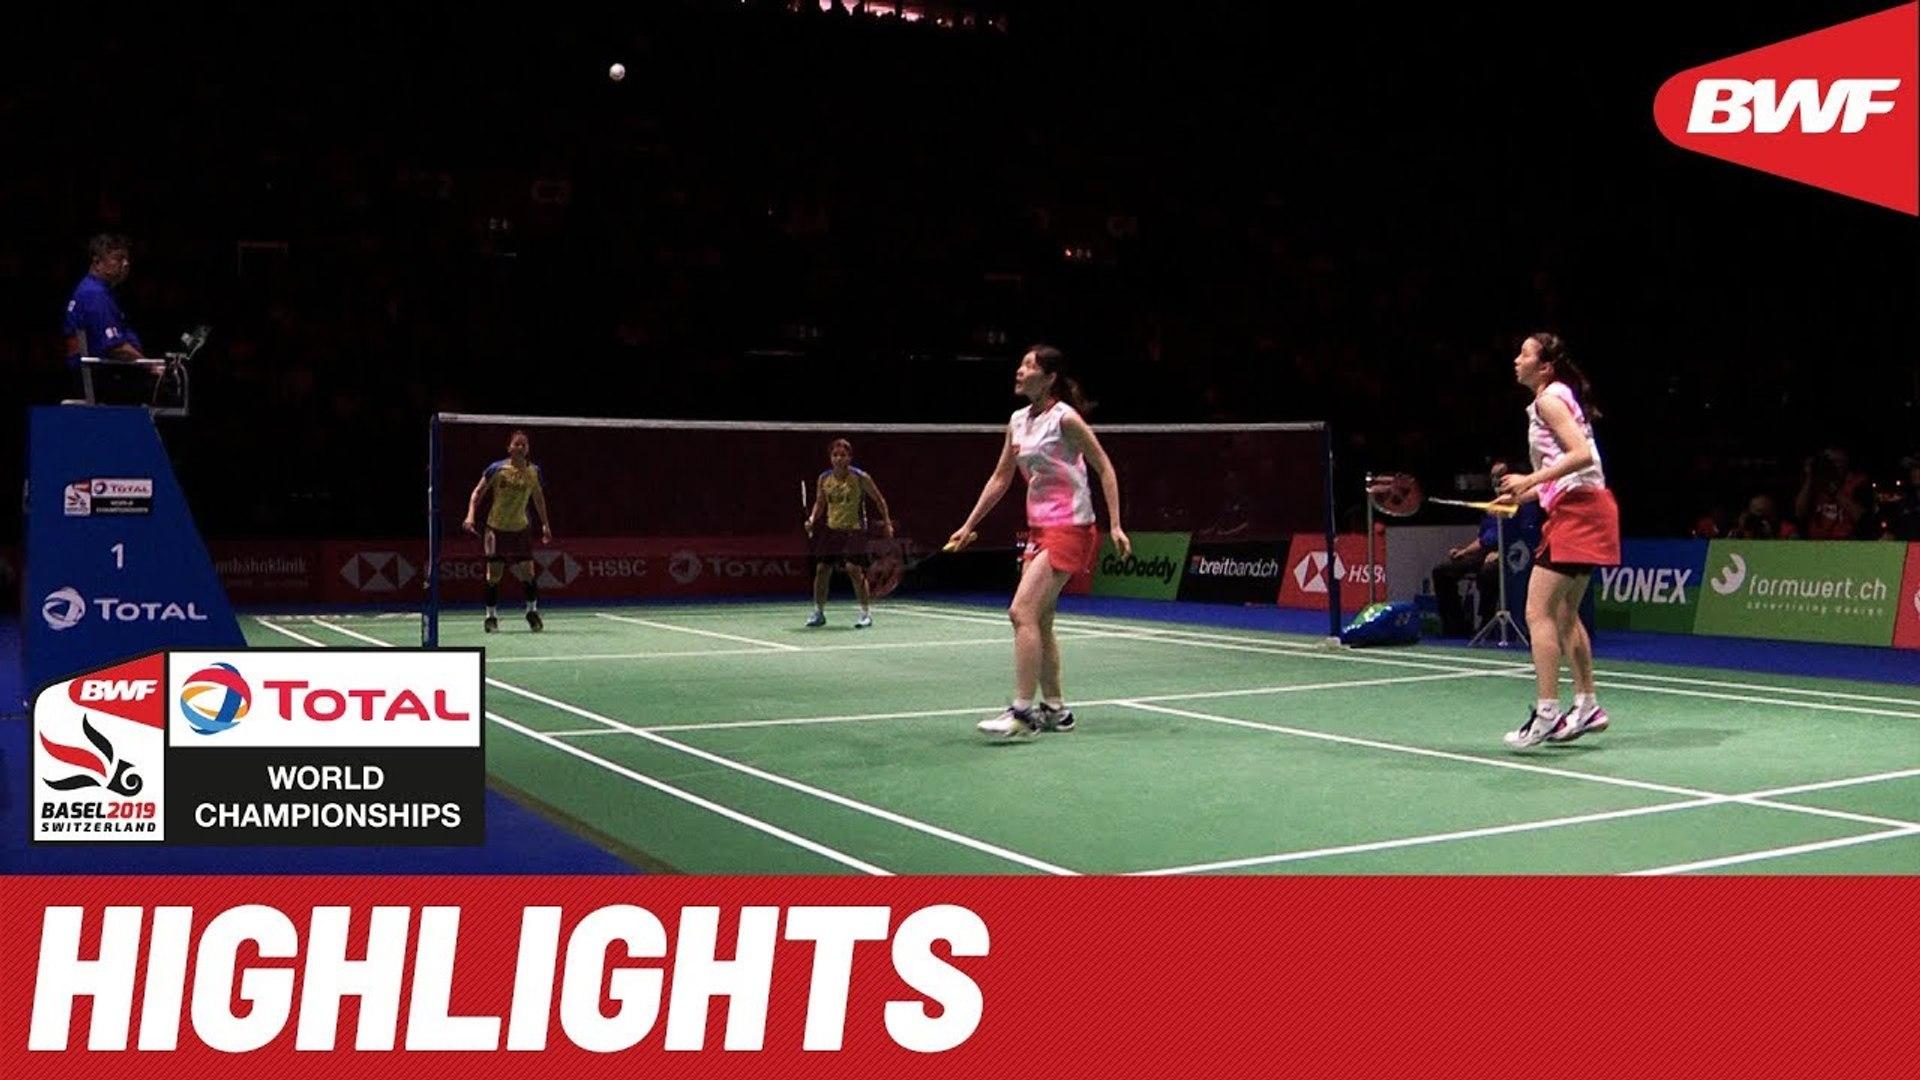 TOTAL BWF World Championships 2019 - Semifinals WD Highlights - BWF 2019